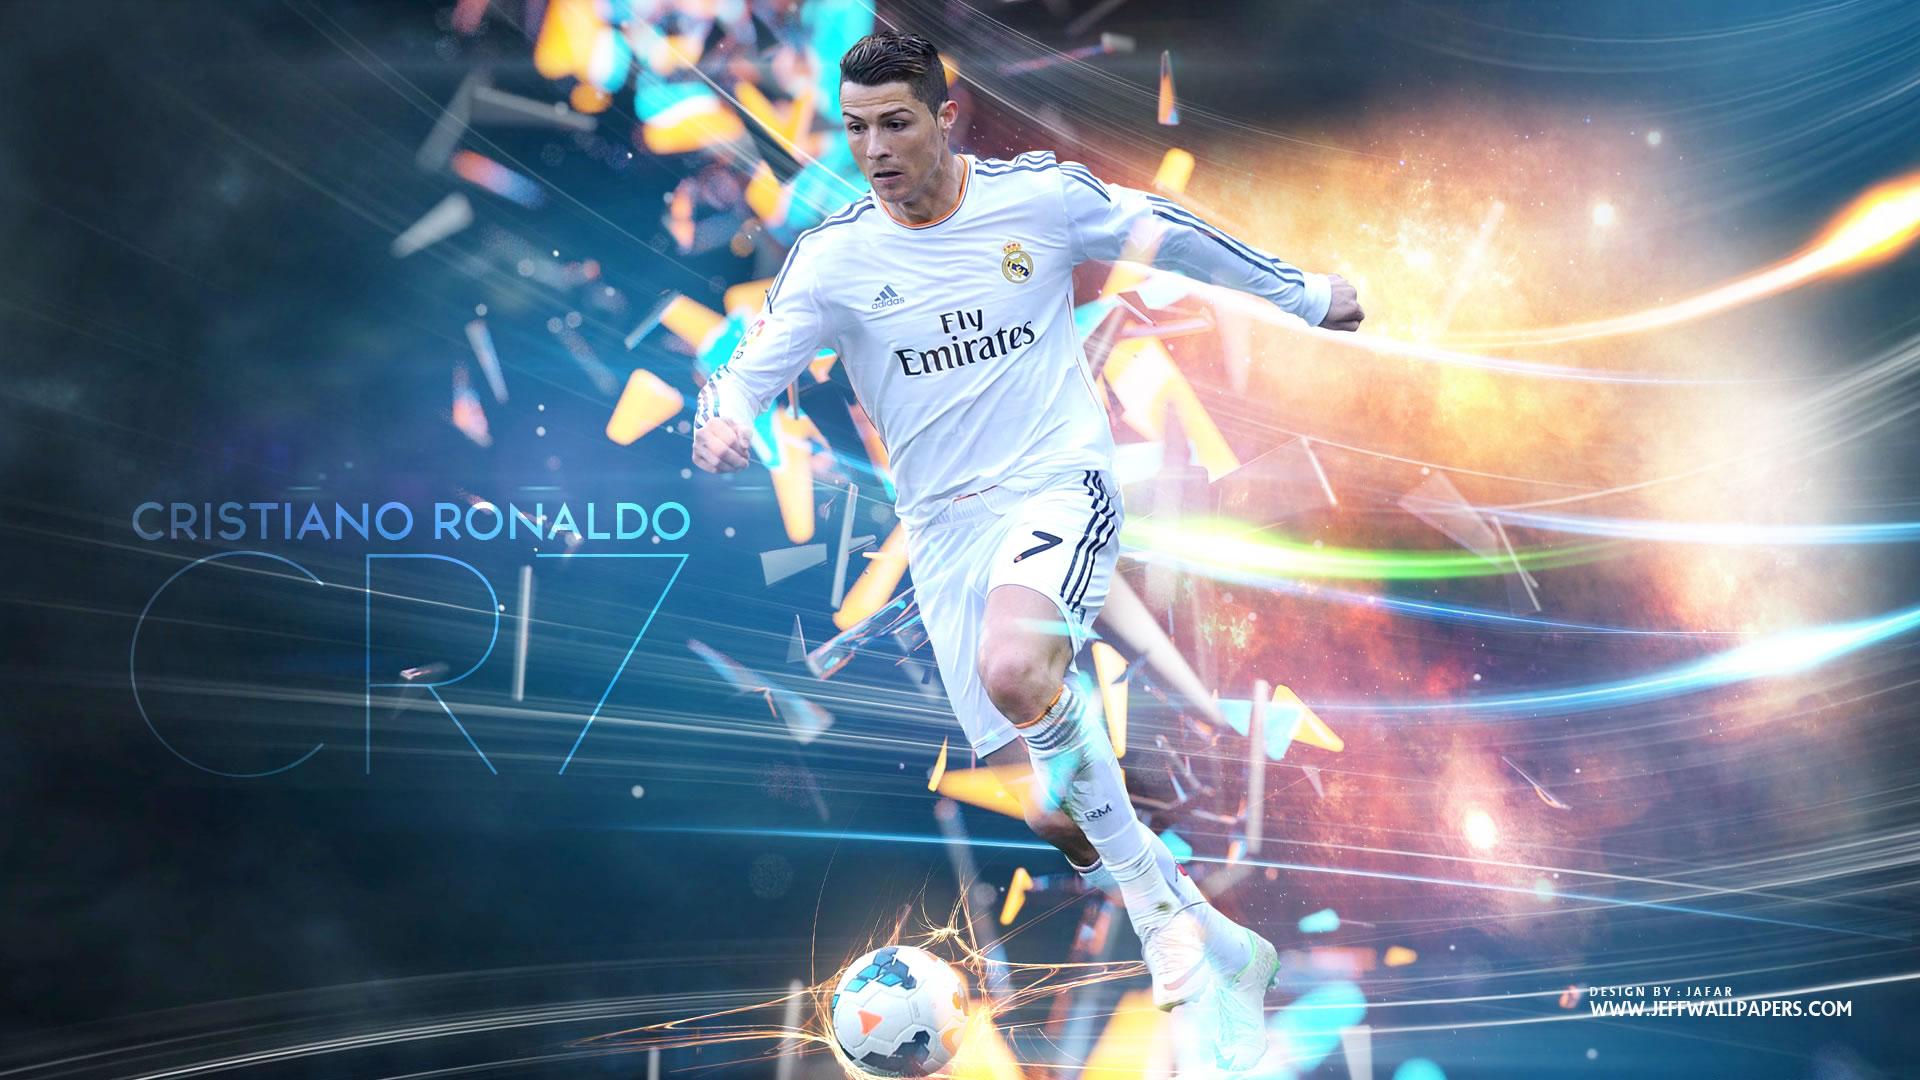 CR7 wallpaper by Jafarjeef   Cristiano Ronaldo Wallpapers 1920x1080